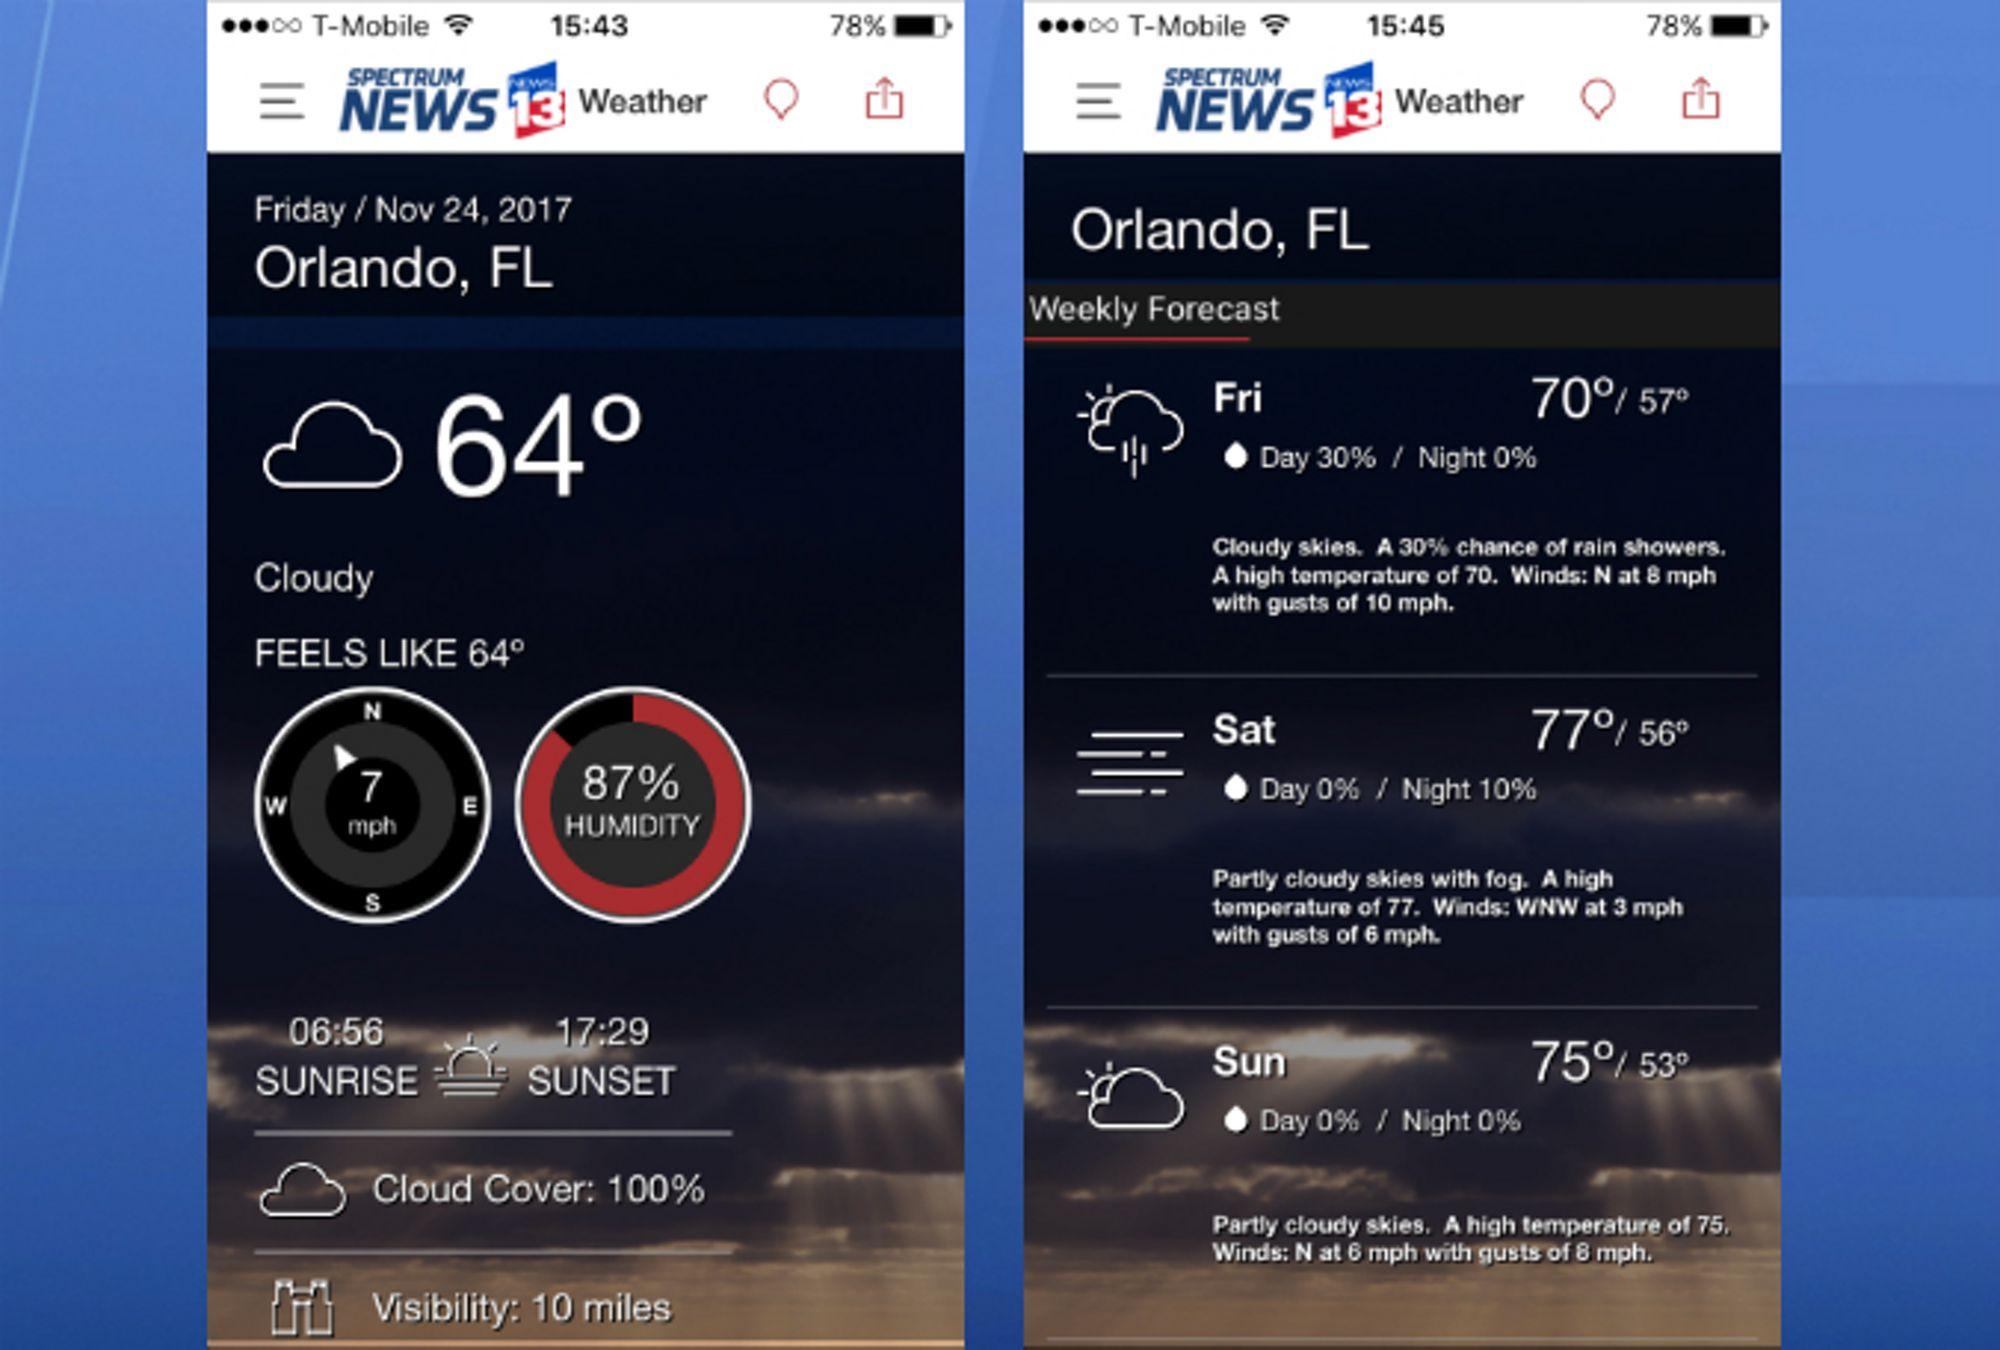 Spectrum News Apps | Central Florida Local News | Spectrum News 13